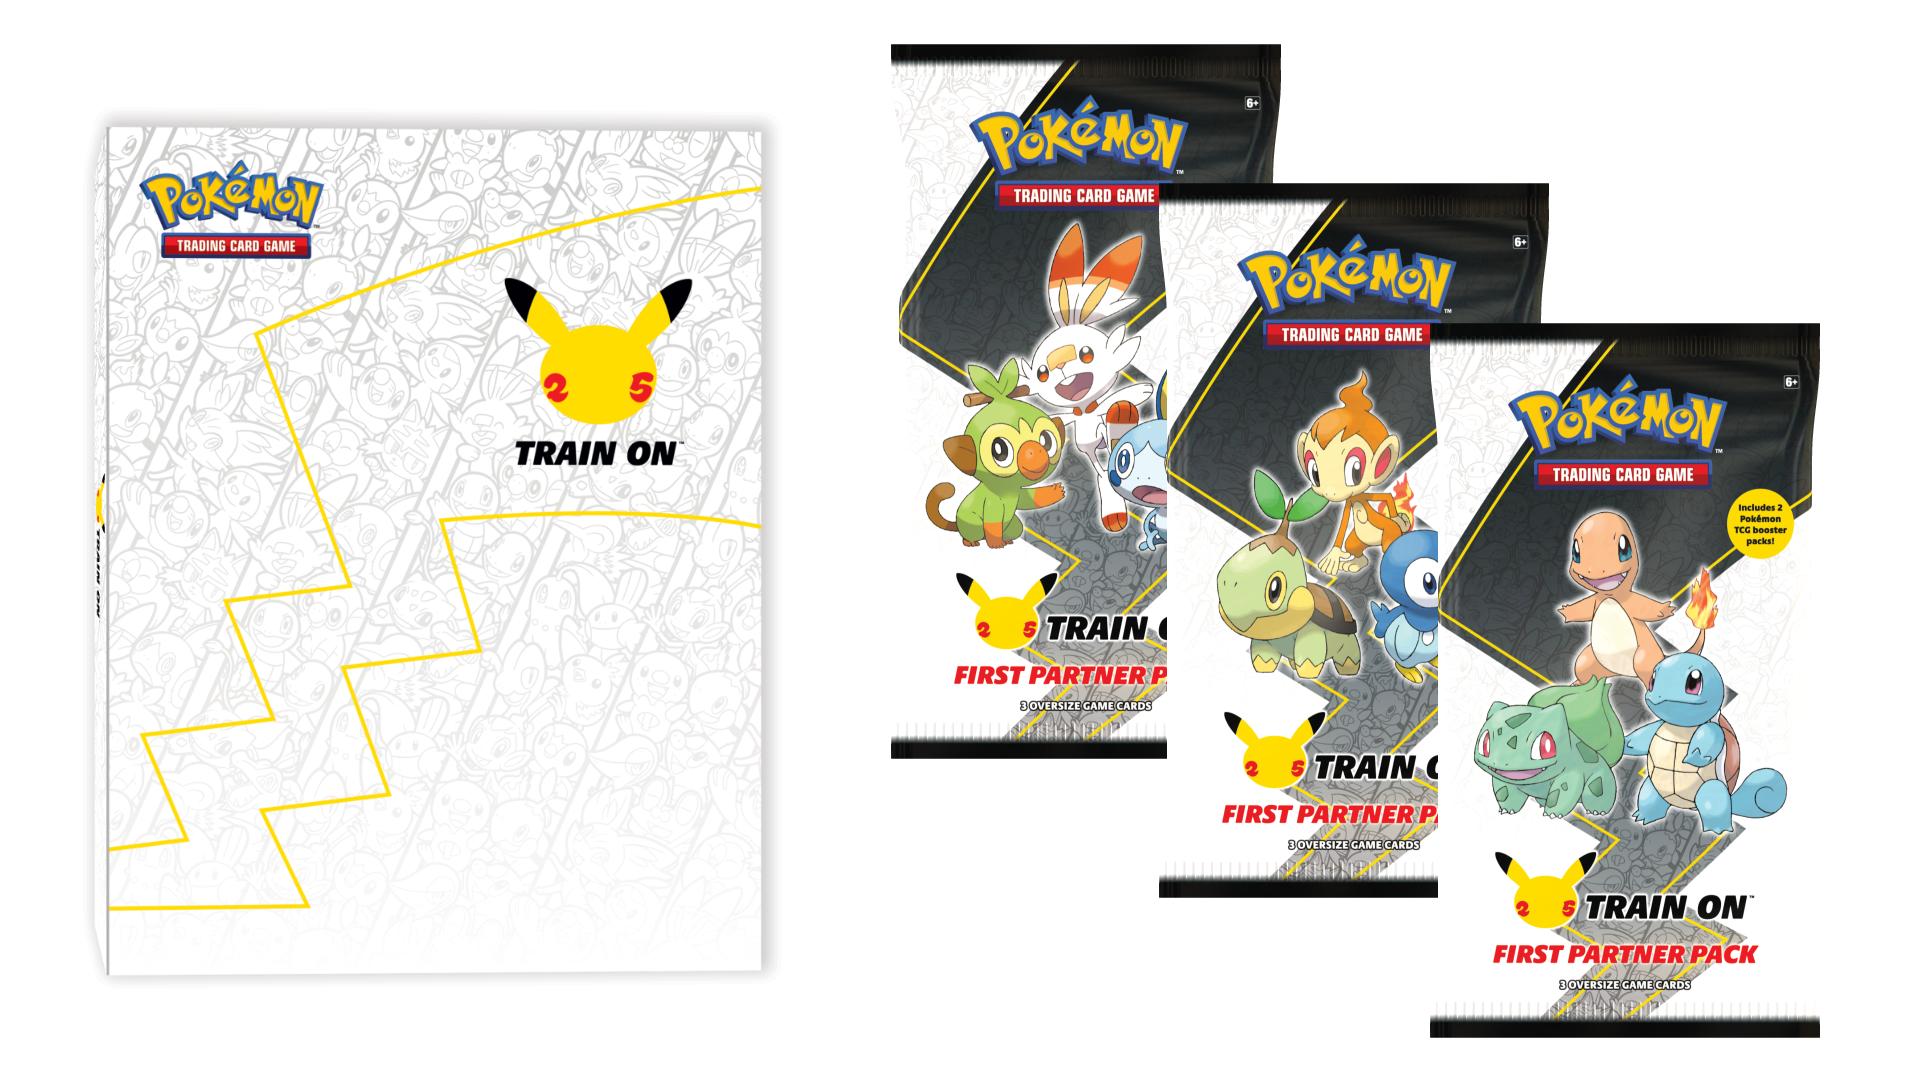 Classic starter Pokémon cards return for the TCG's 25th anniversary |  Dicebreaker